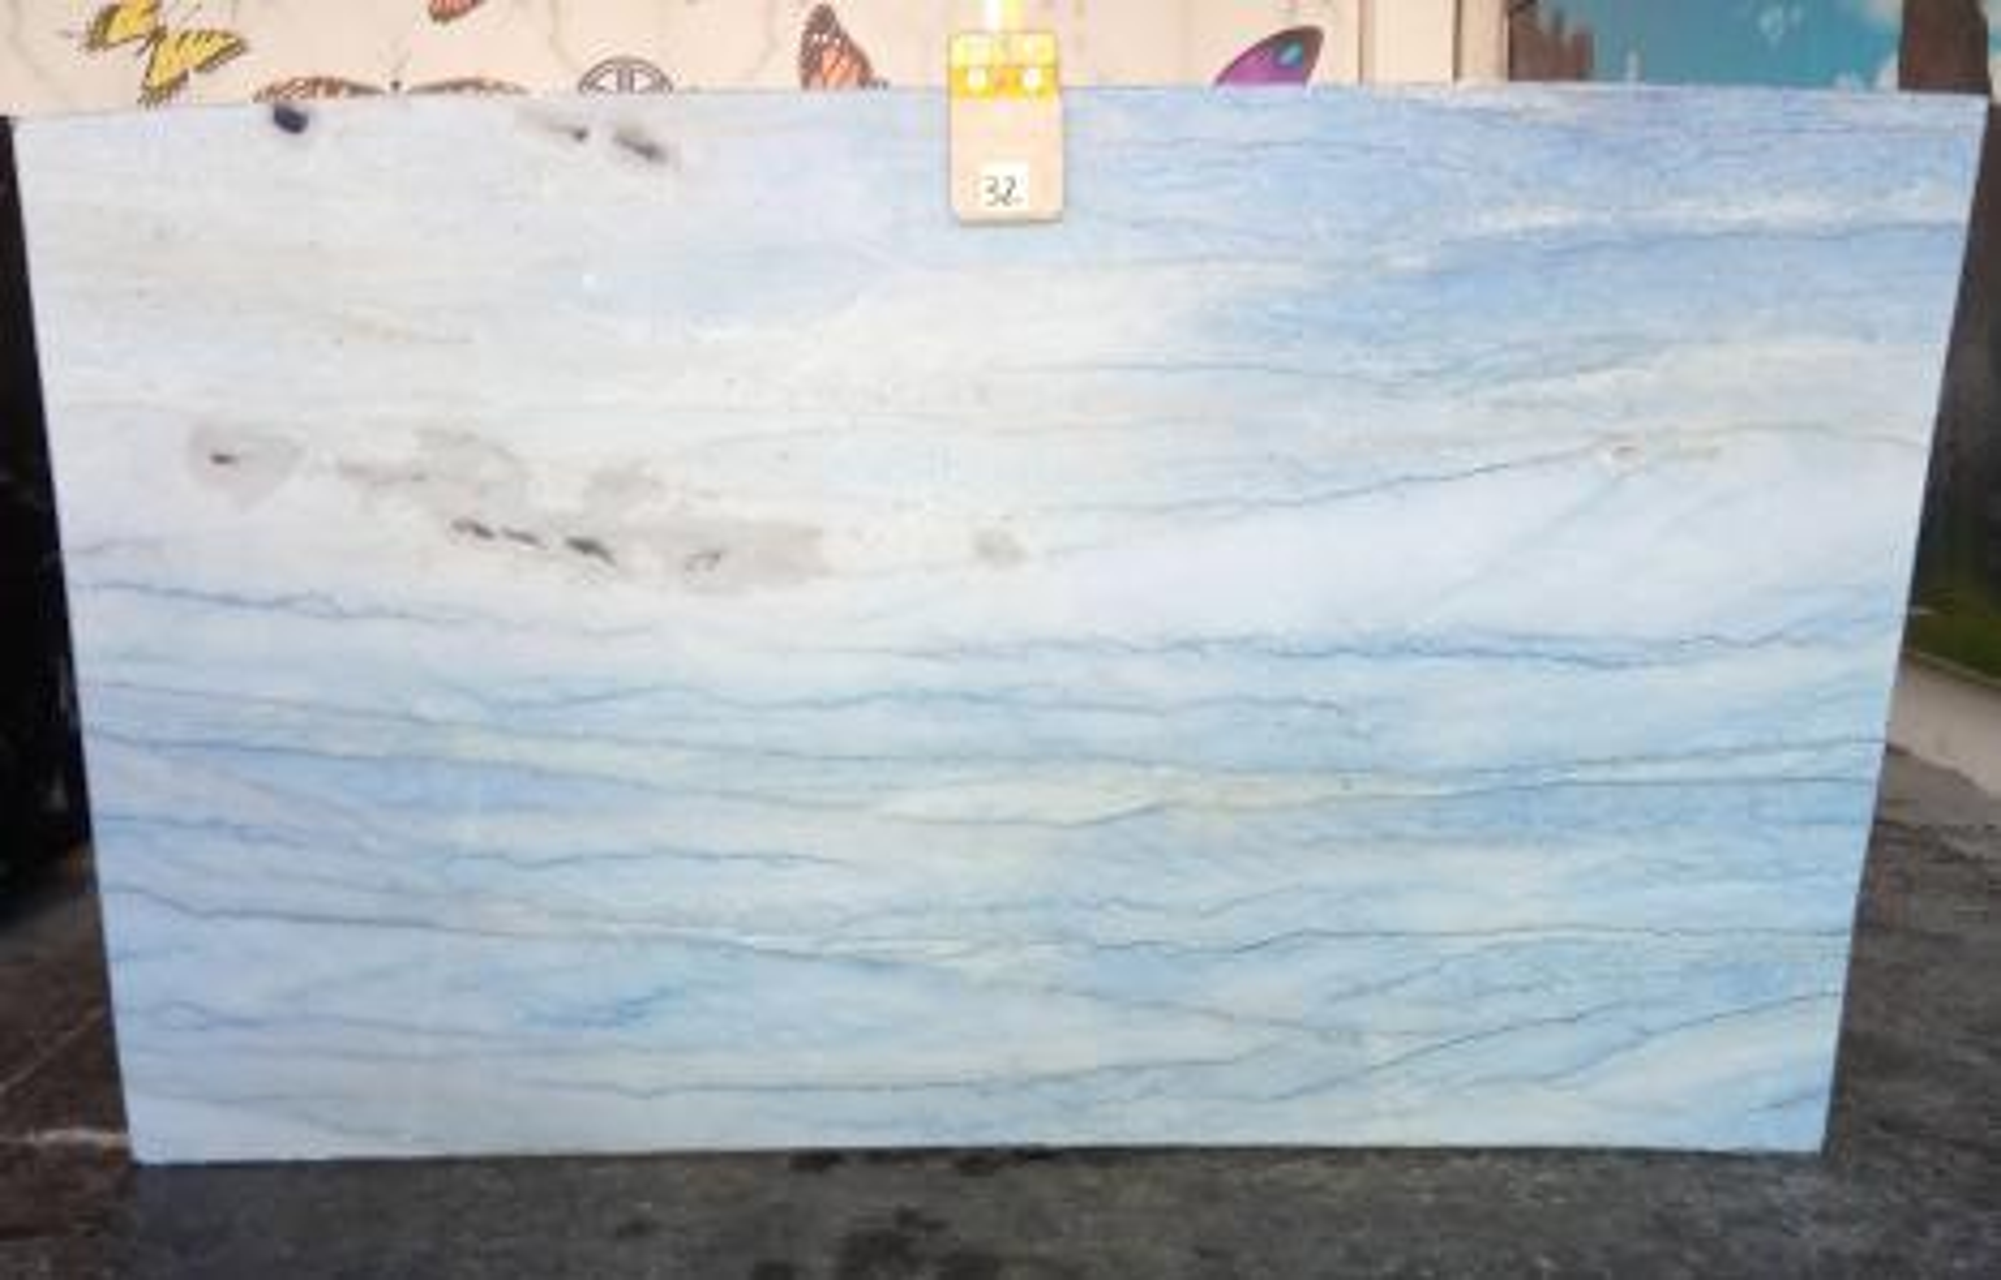 AZUL MAKAUBA polierte Unmaßplatten Z0191 aus Natur Marmor , Slab #32: Lieferung Veneto, Italien